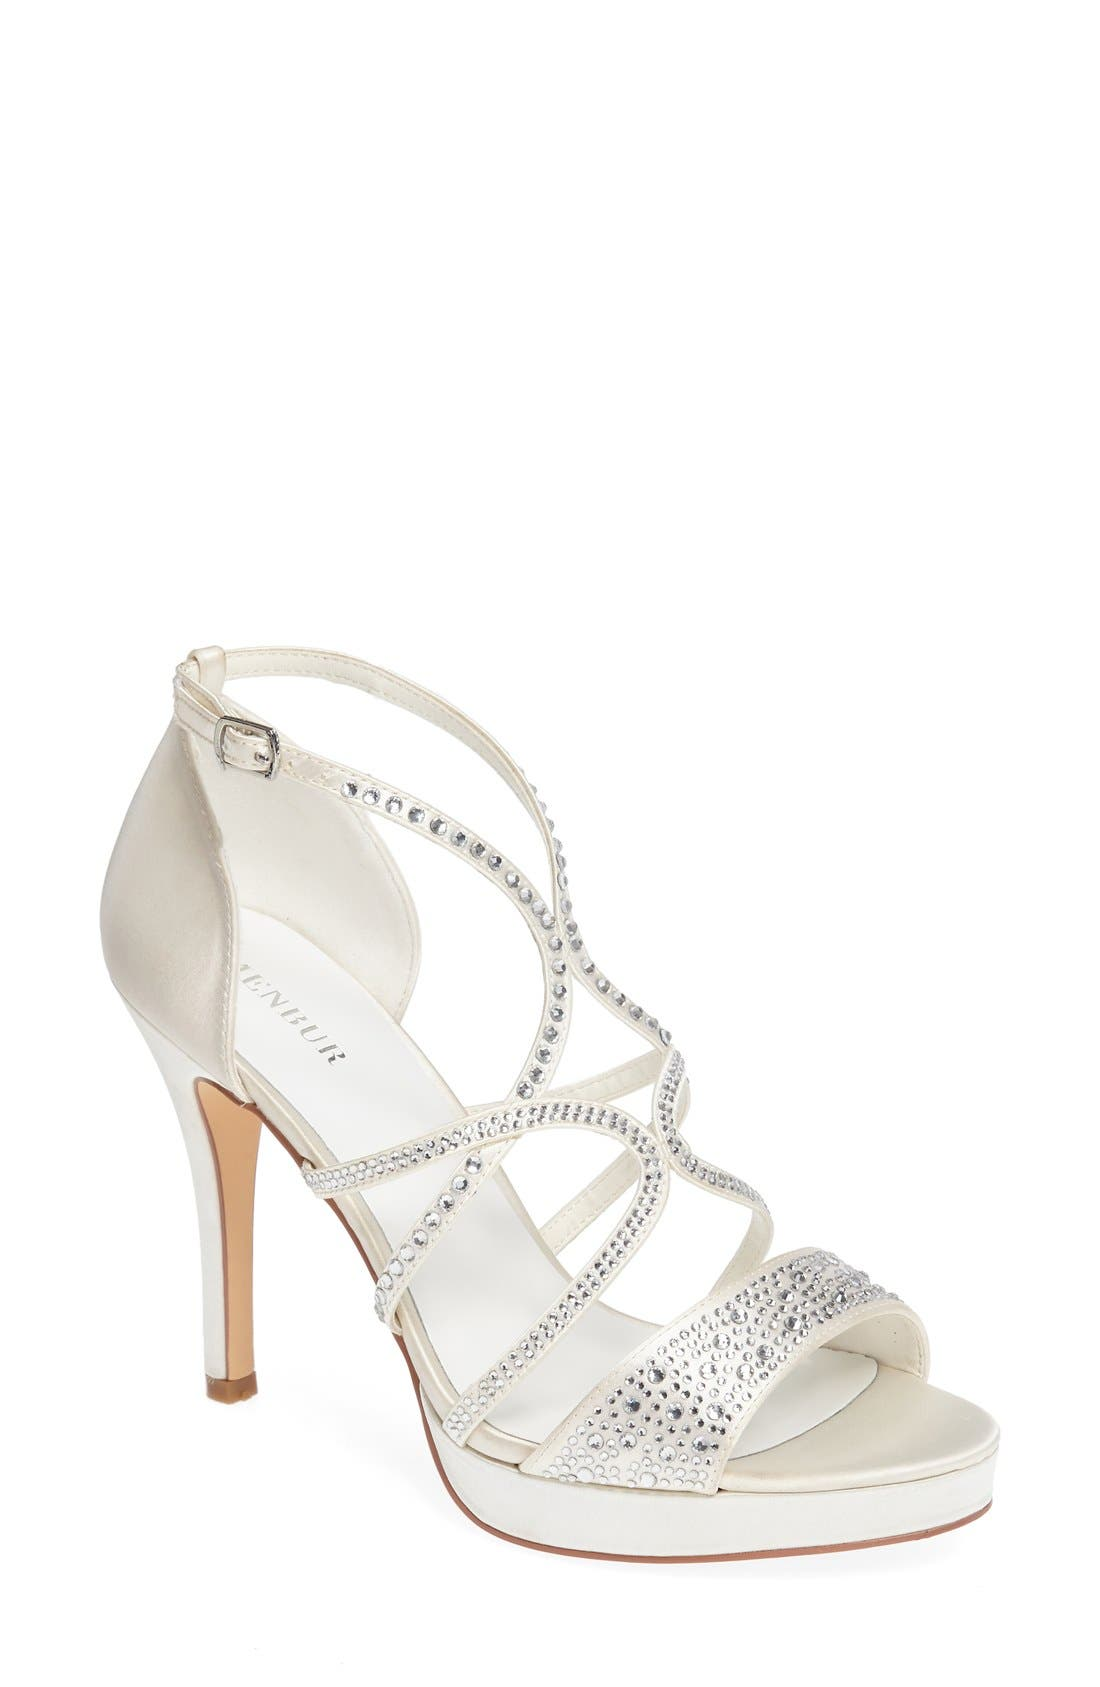 Main Image - Menbur Maite Platform Sandal (Women)